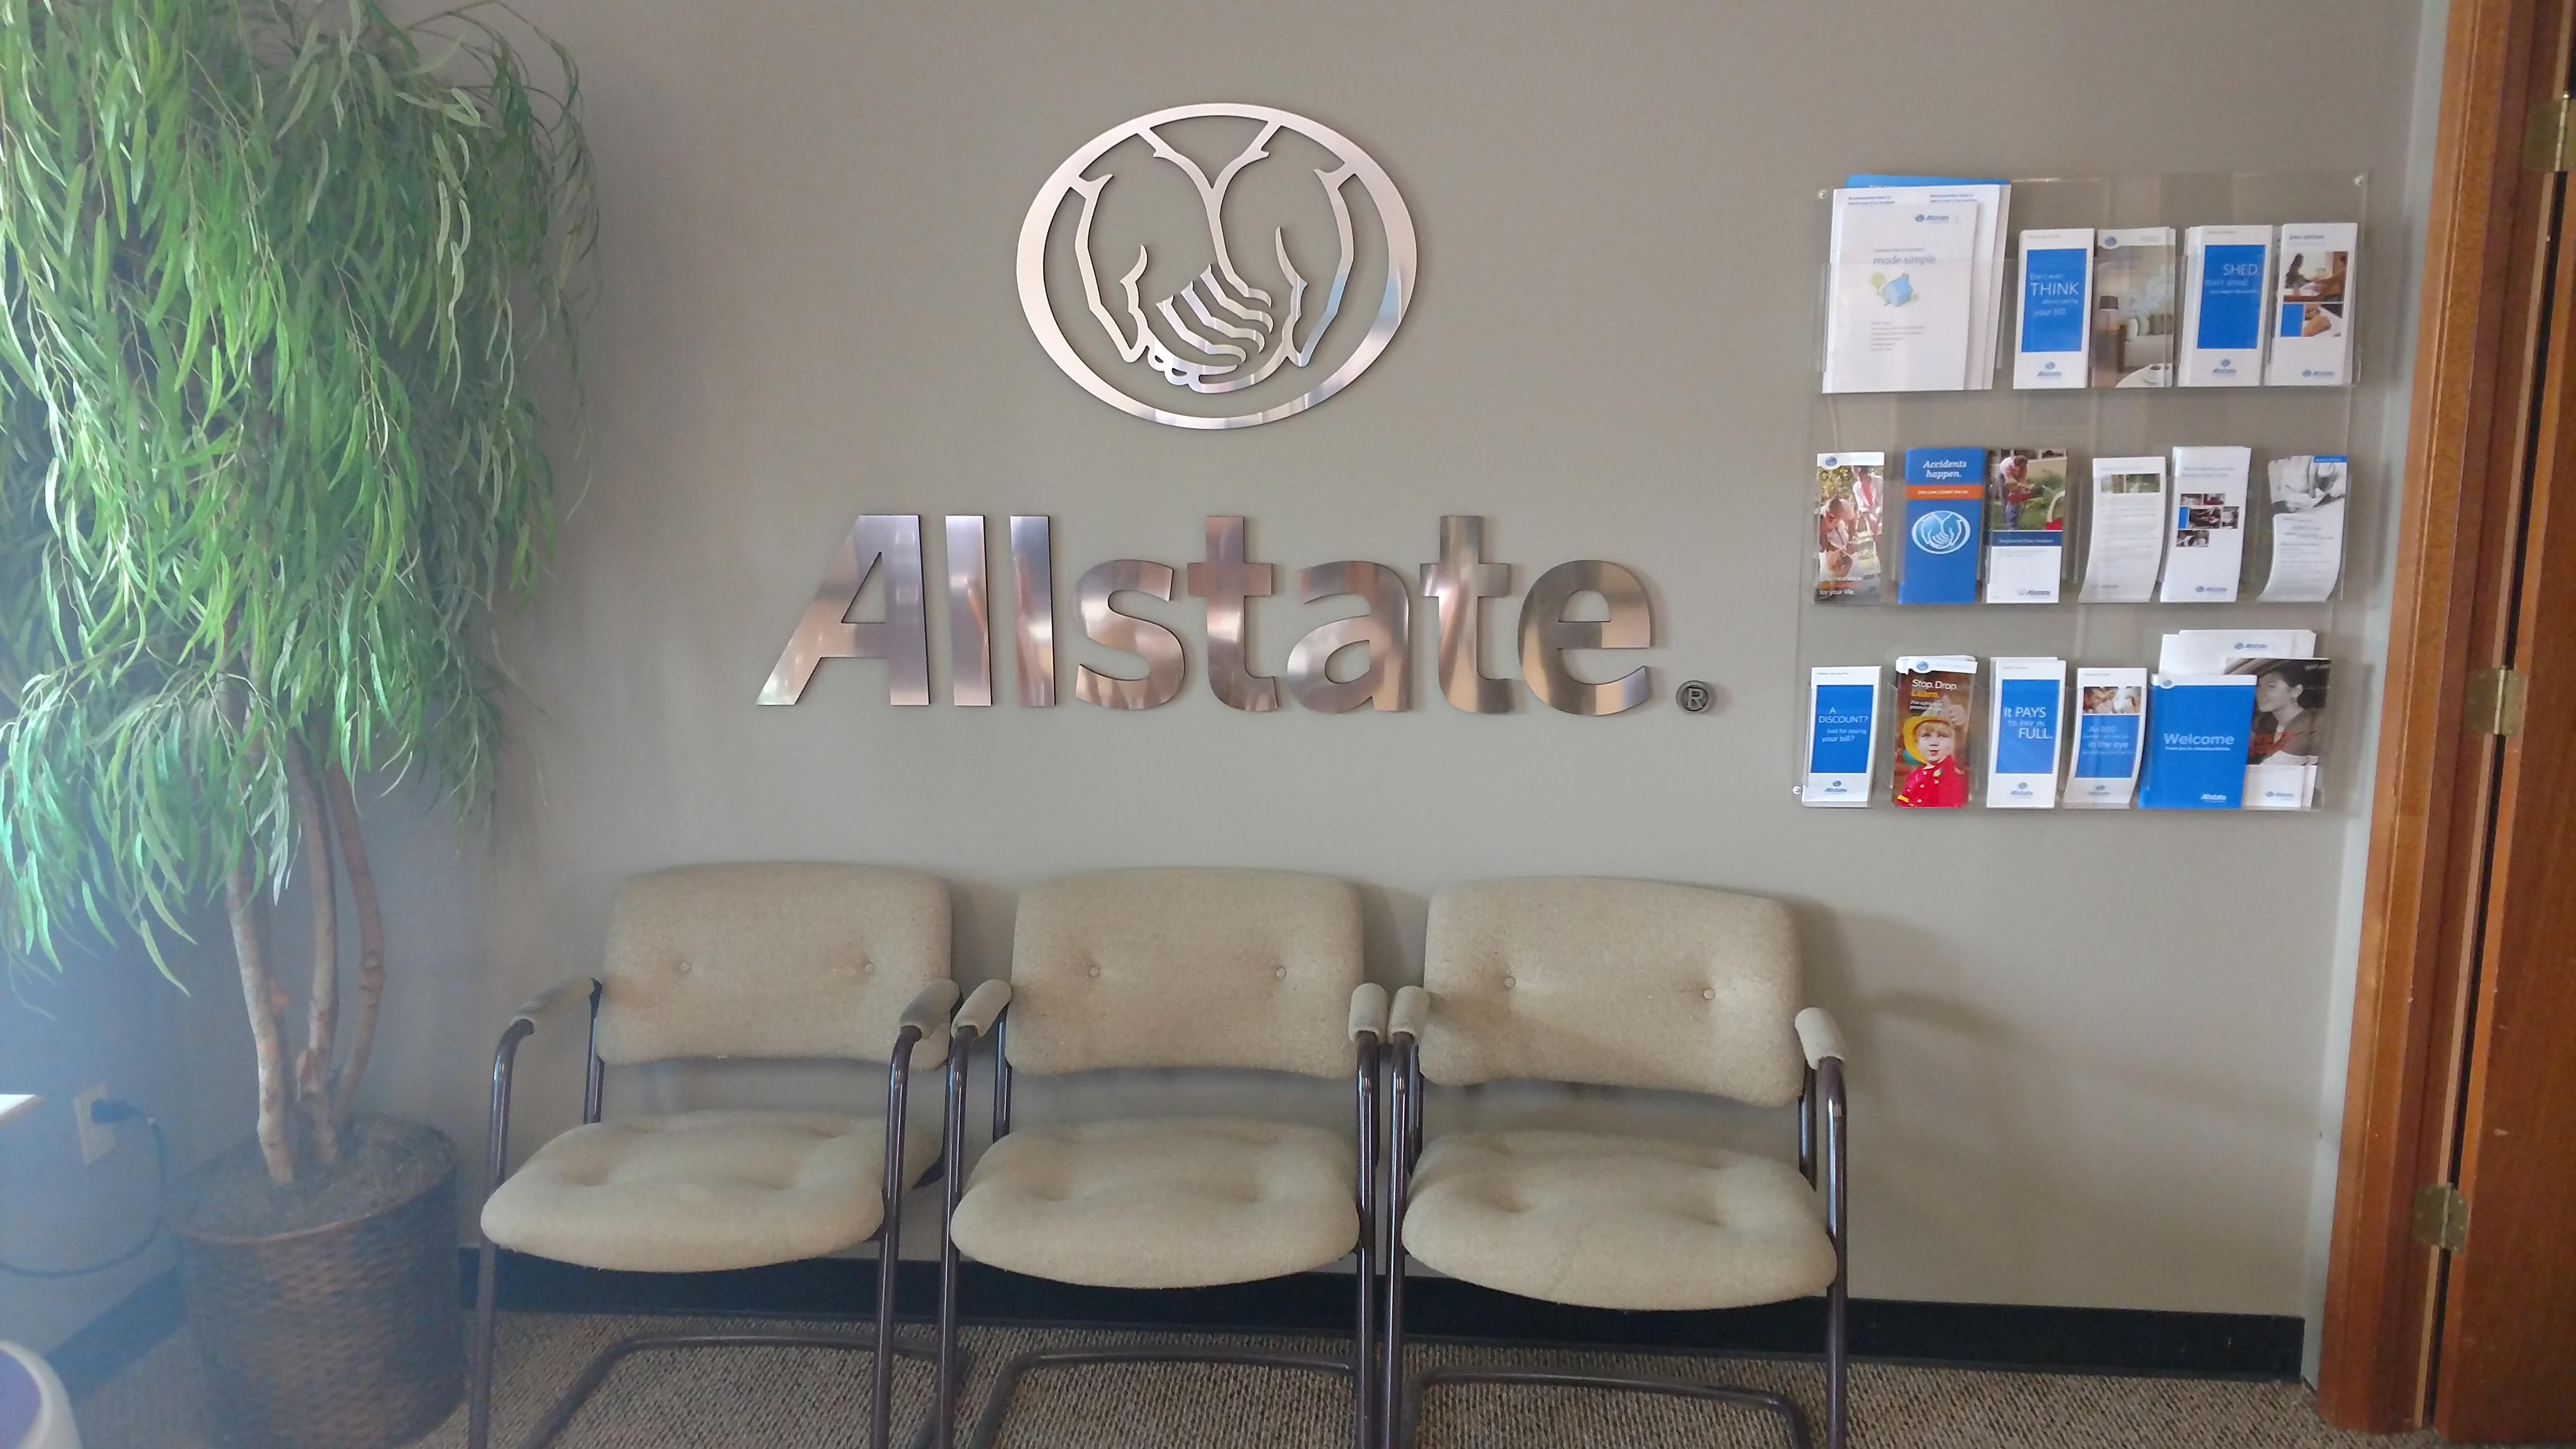 Brady Vaudt: Allstate Insurance image 2